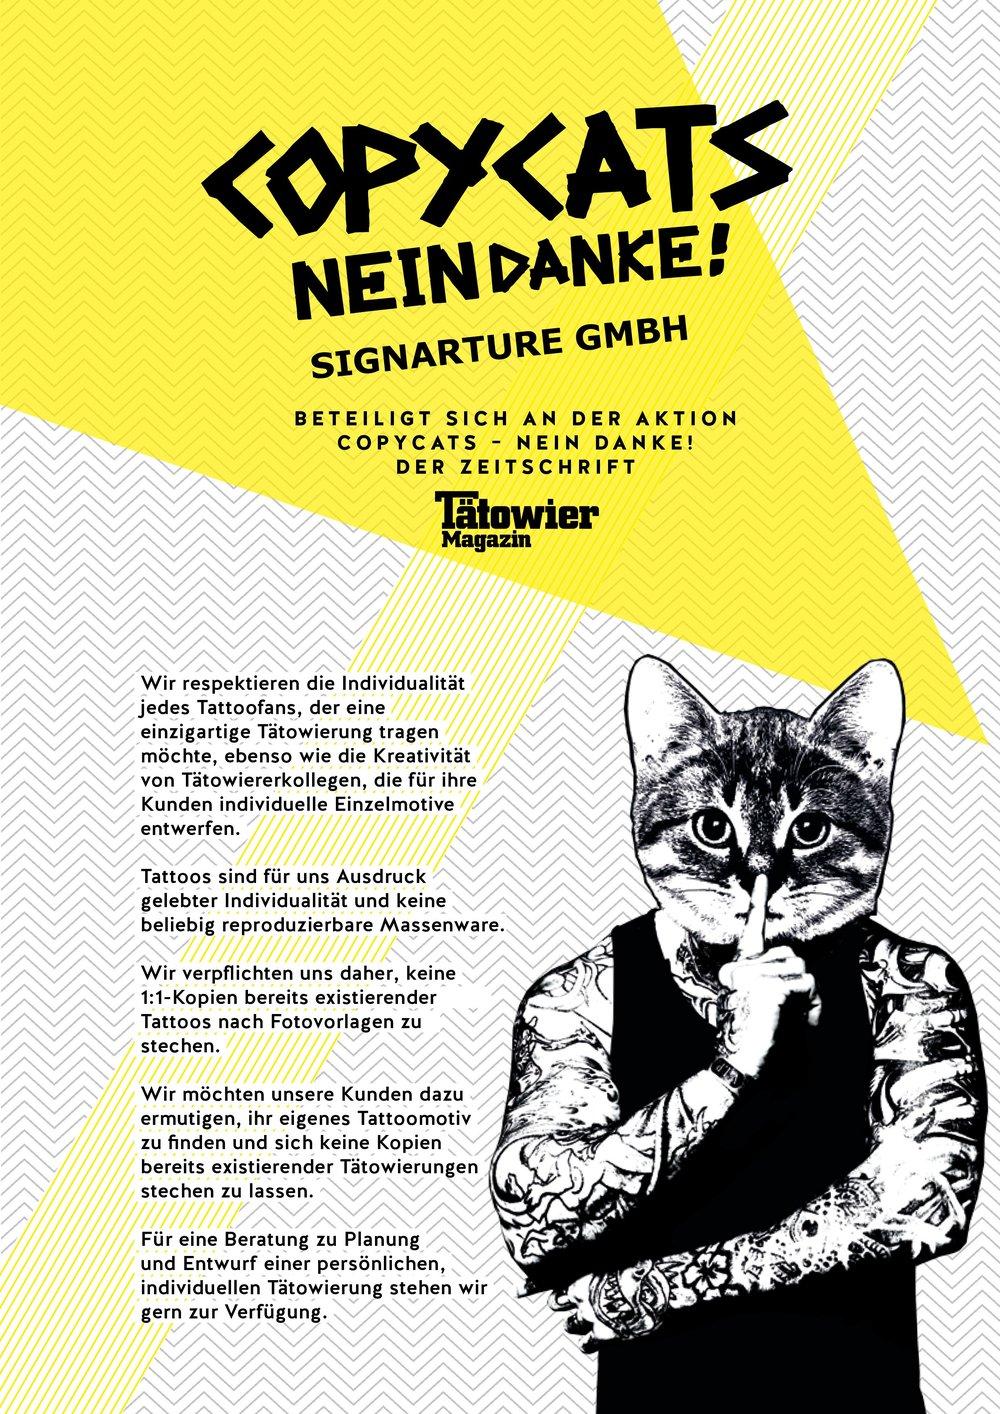 Copycats No Thanks | Signarture GmbH